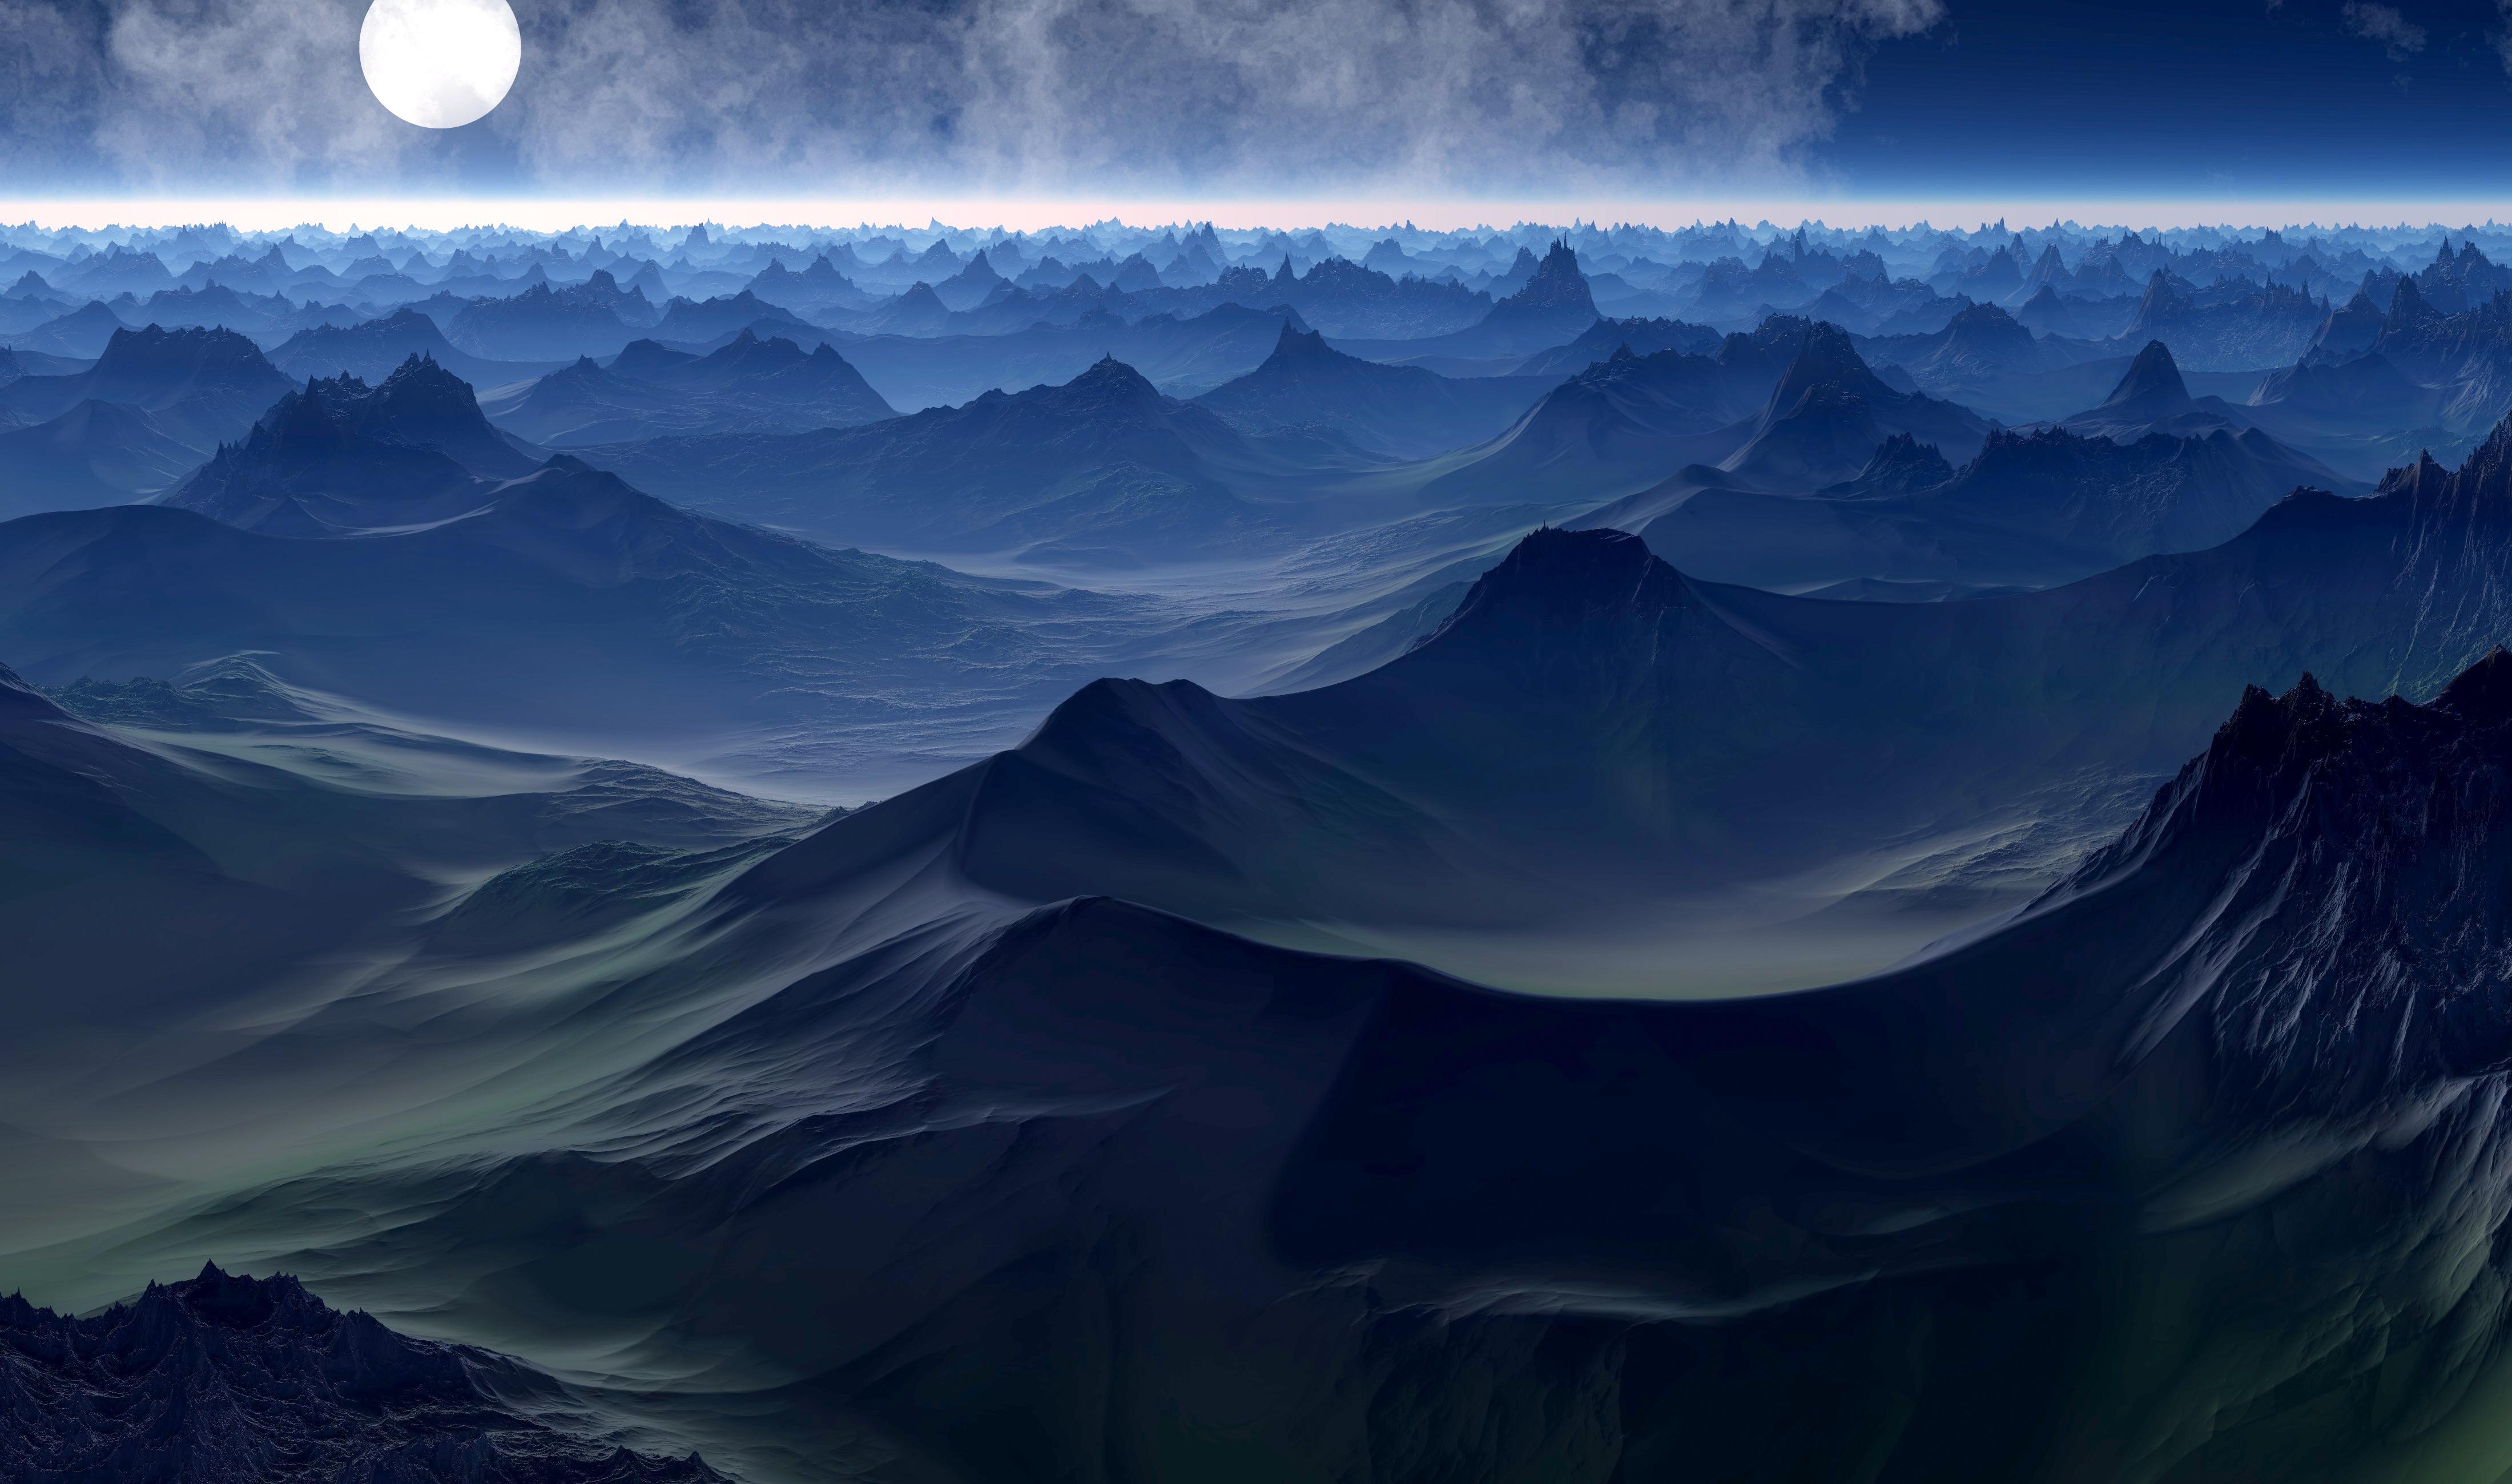 Top Wallpaper Mountain Fantasy - fantasy-landscape-mountains-in-fantasy-world-5k-j4  Perfect Image Reference_439783.jpg